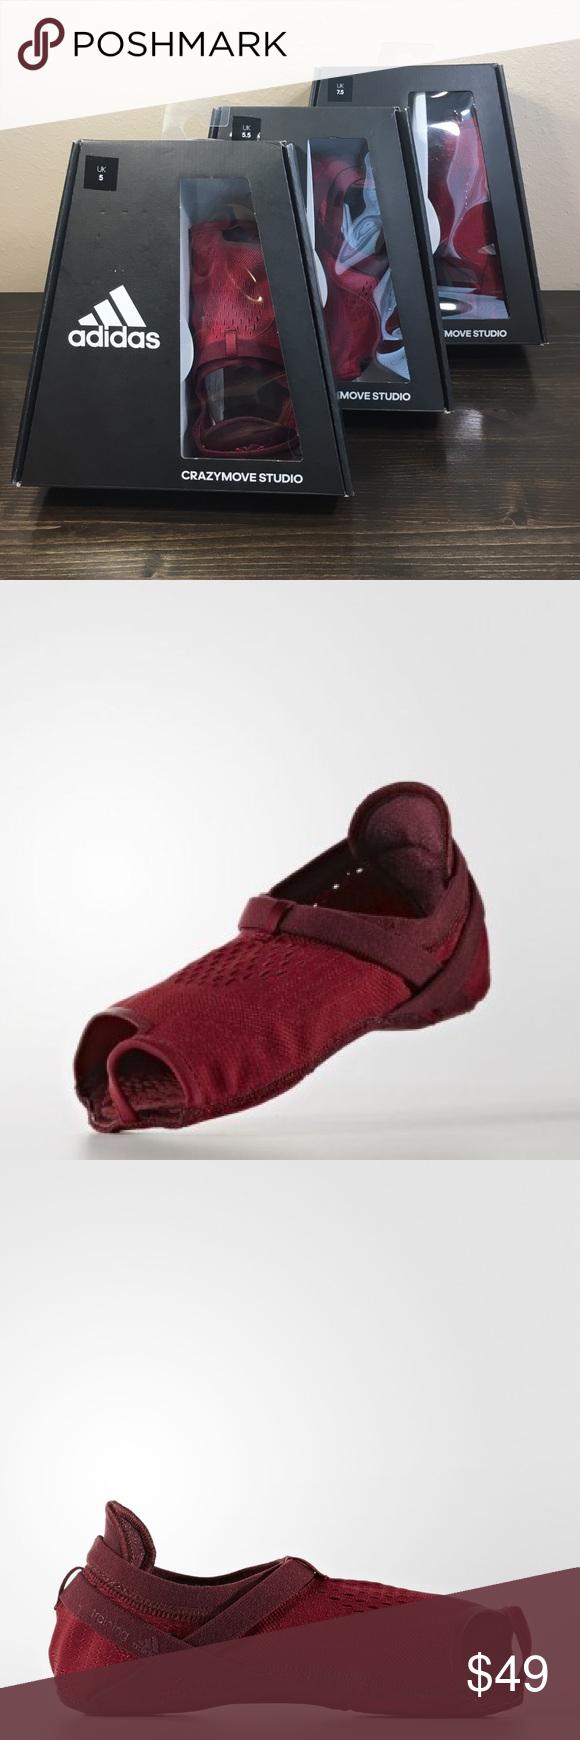 adidas CrazyMove Studio Dance Yoga Pilates Shoes Brand New